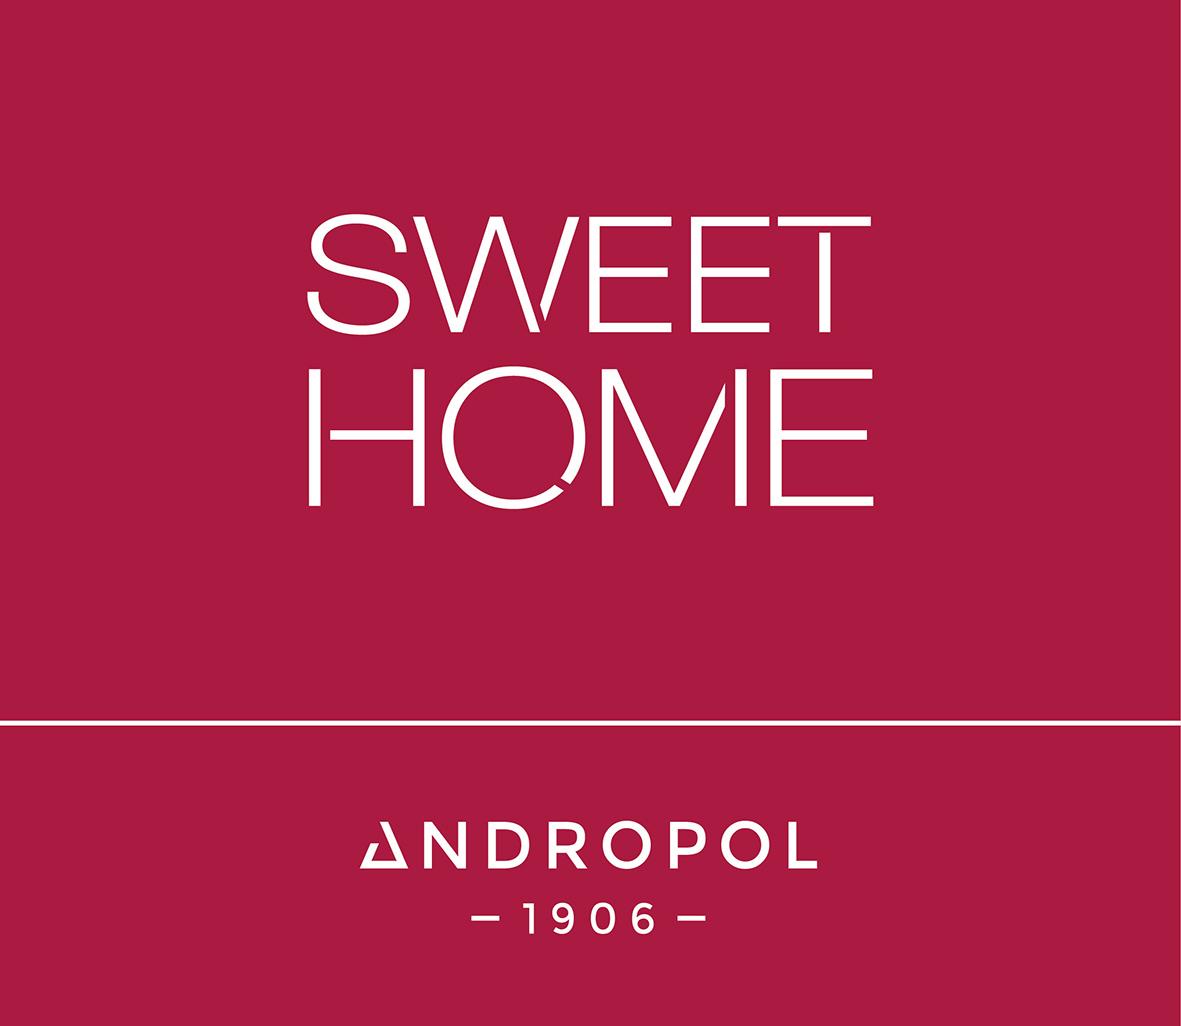 Sweet Home - Andropol S.A. - Polski Producent Tkanin